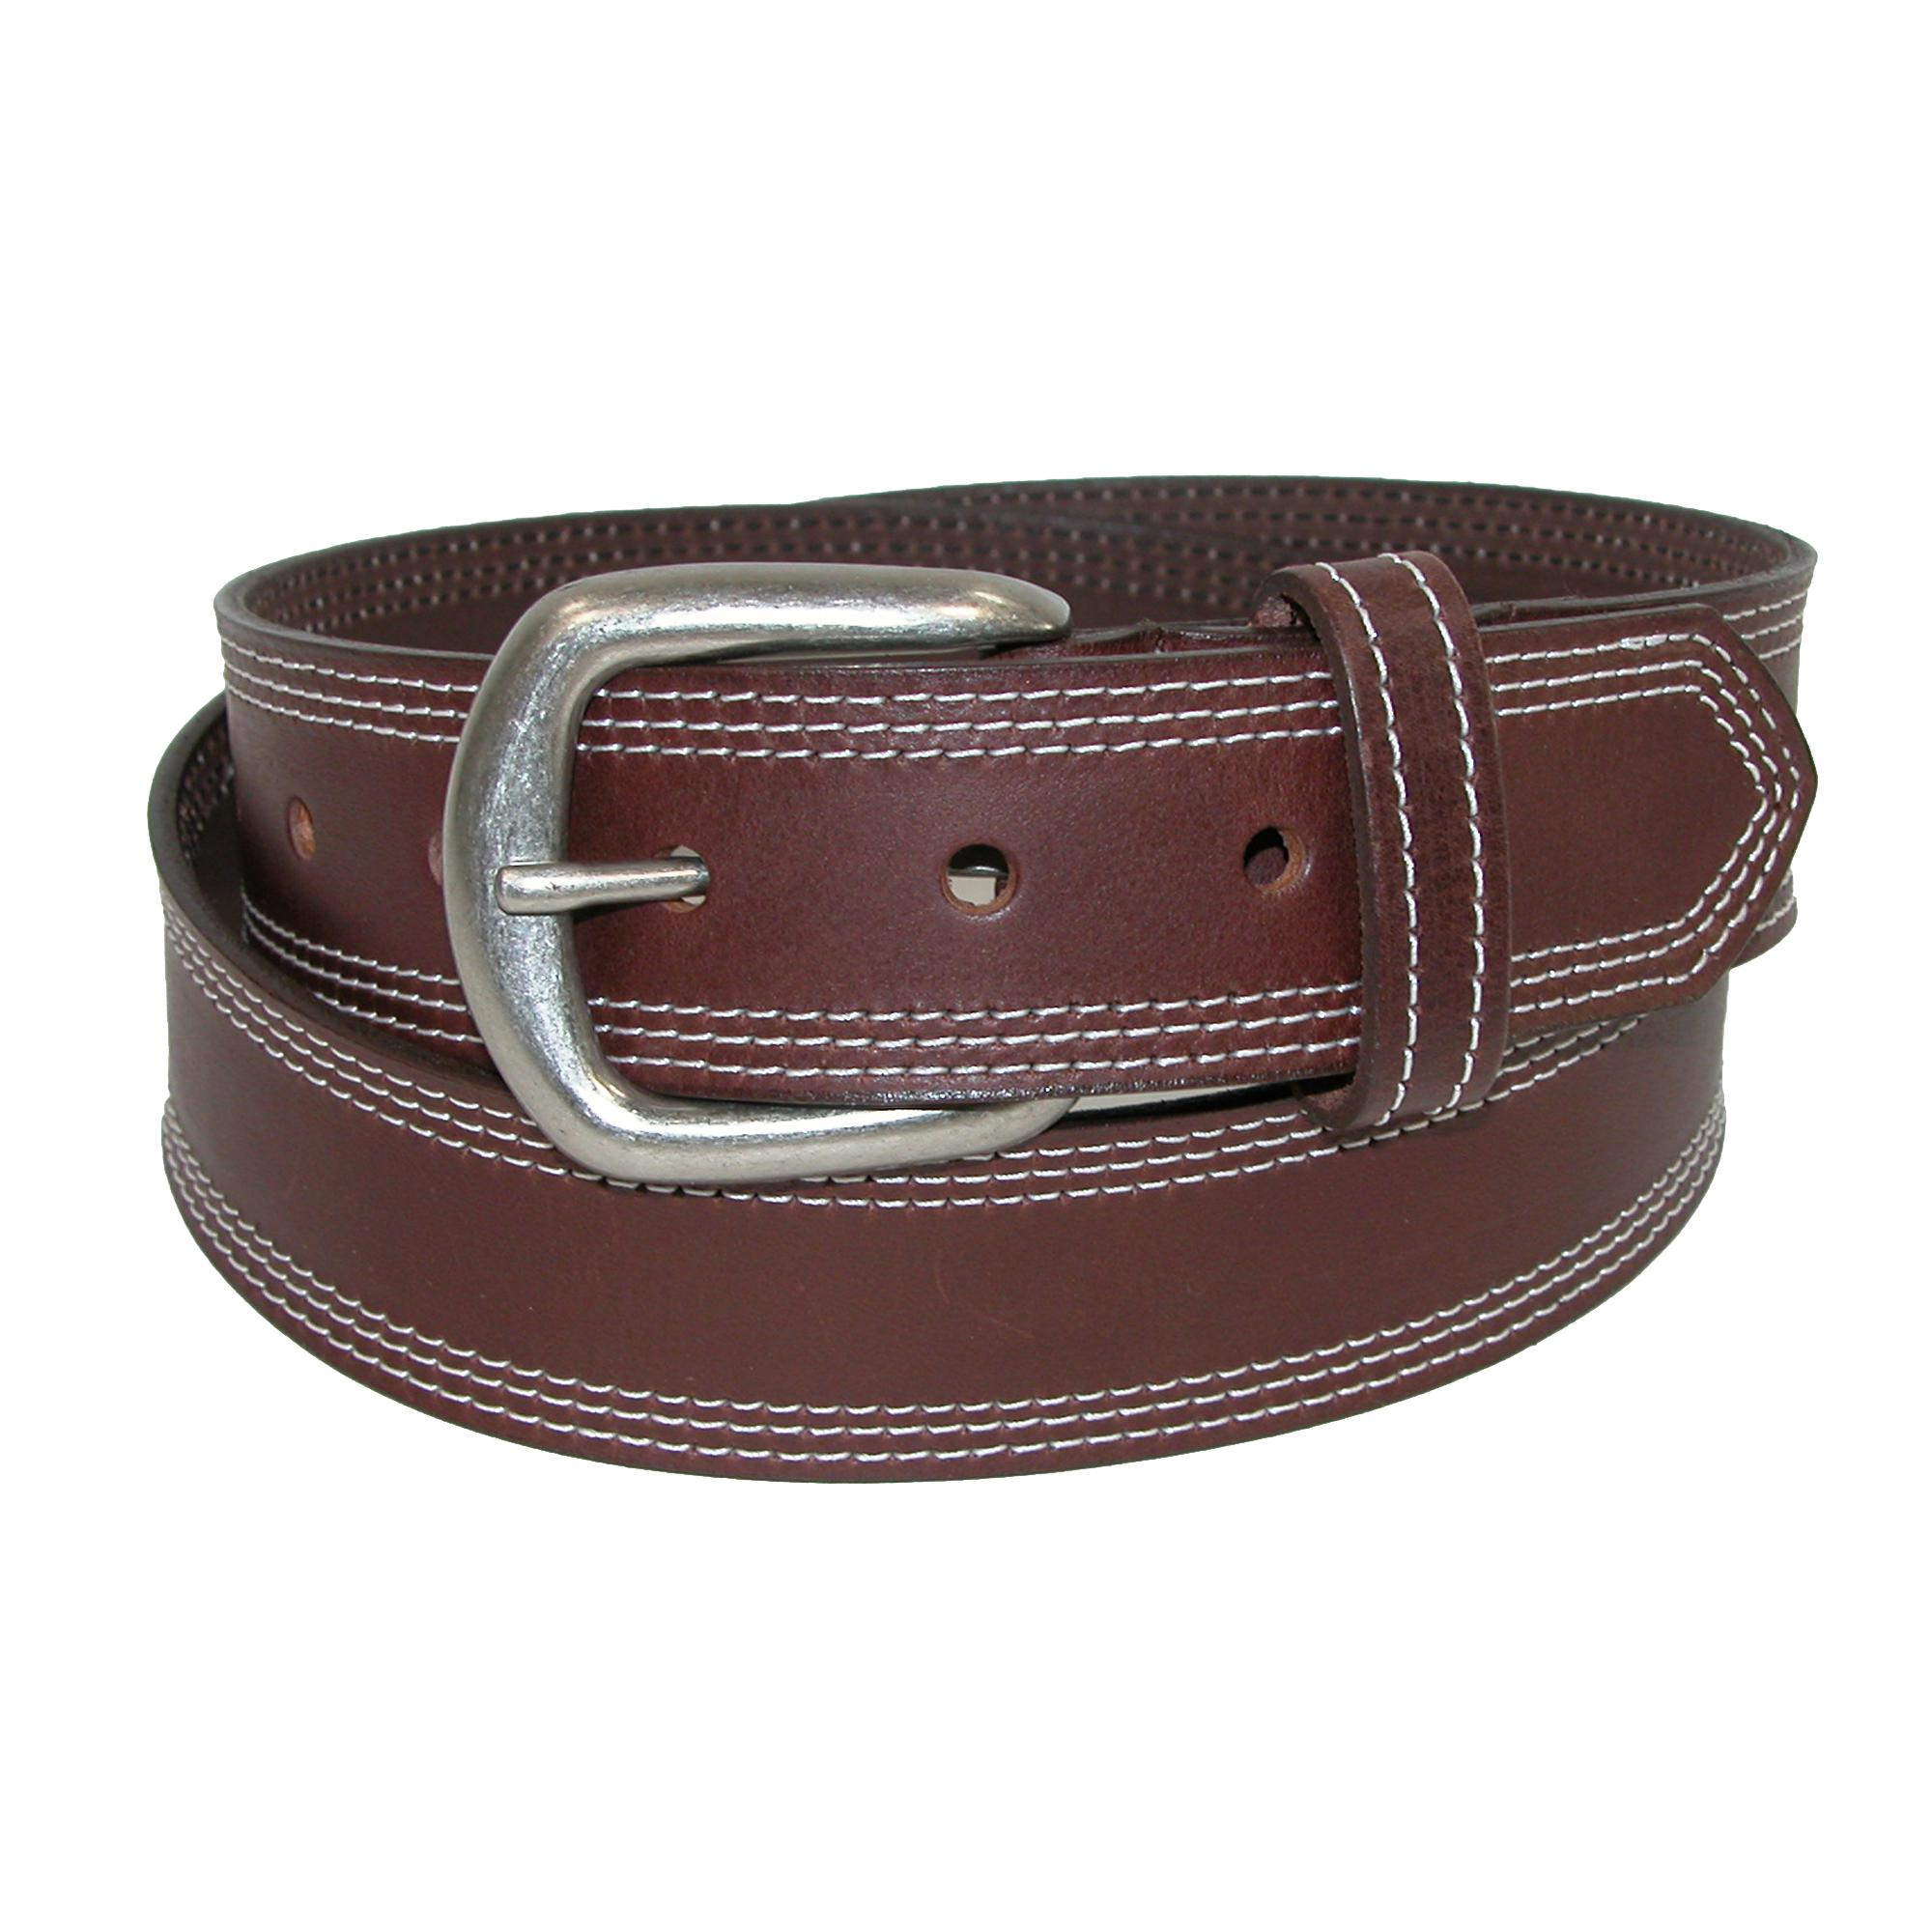 Boston Leather Men's Leather Contrast Triple Stitch Bridle Belt